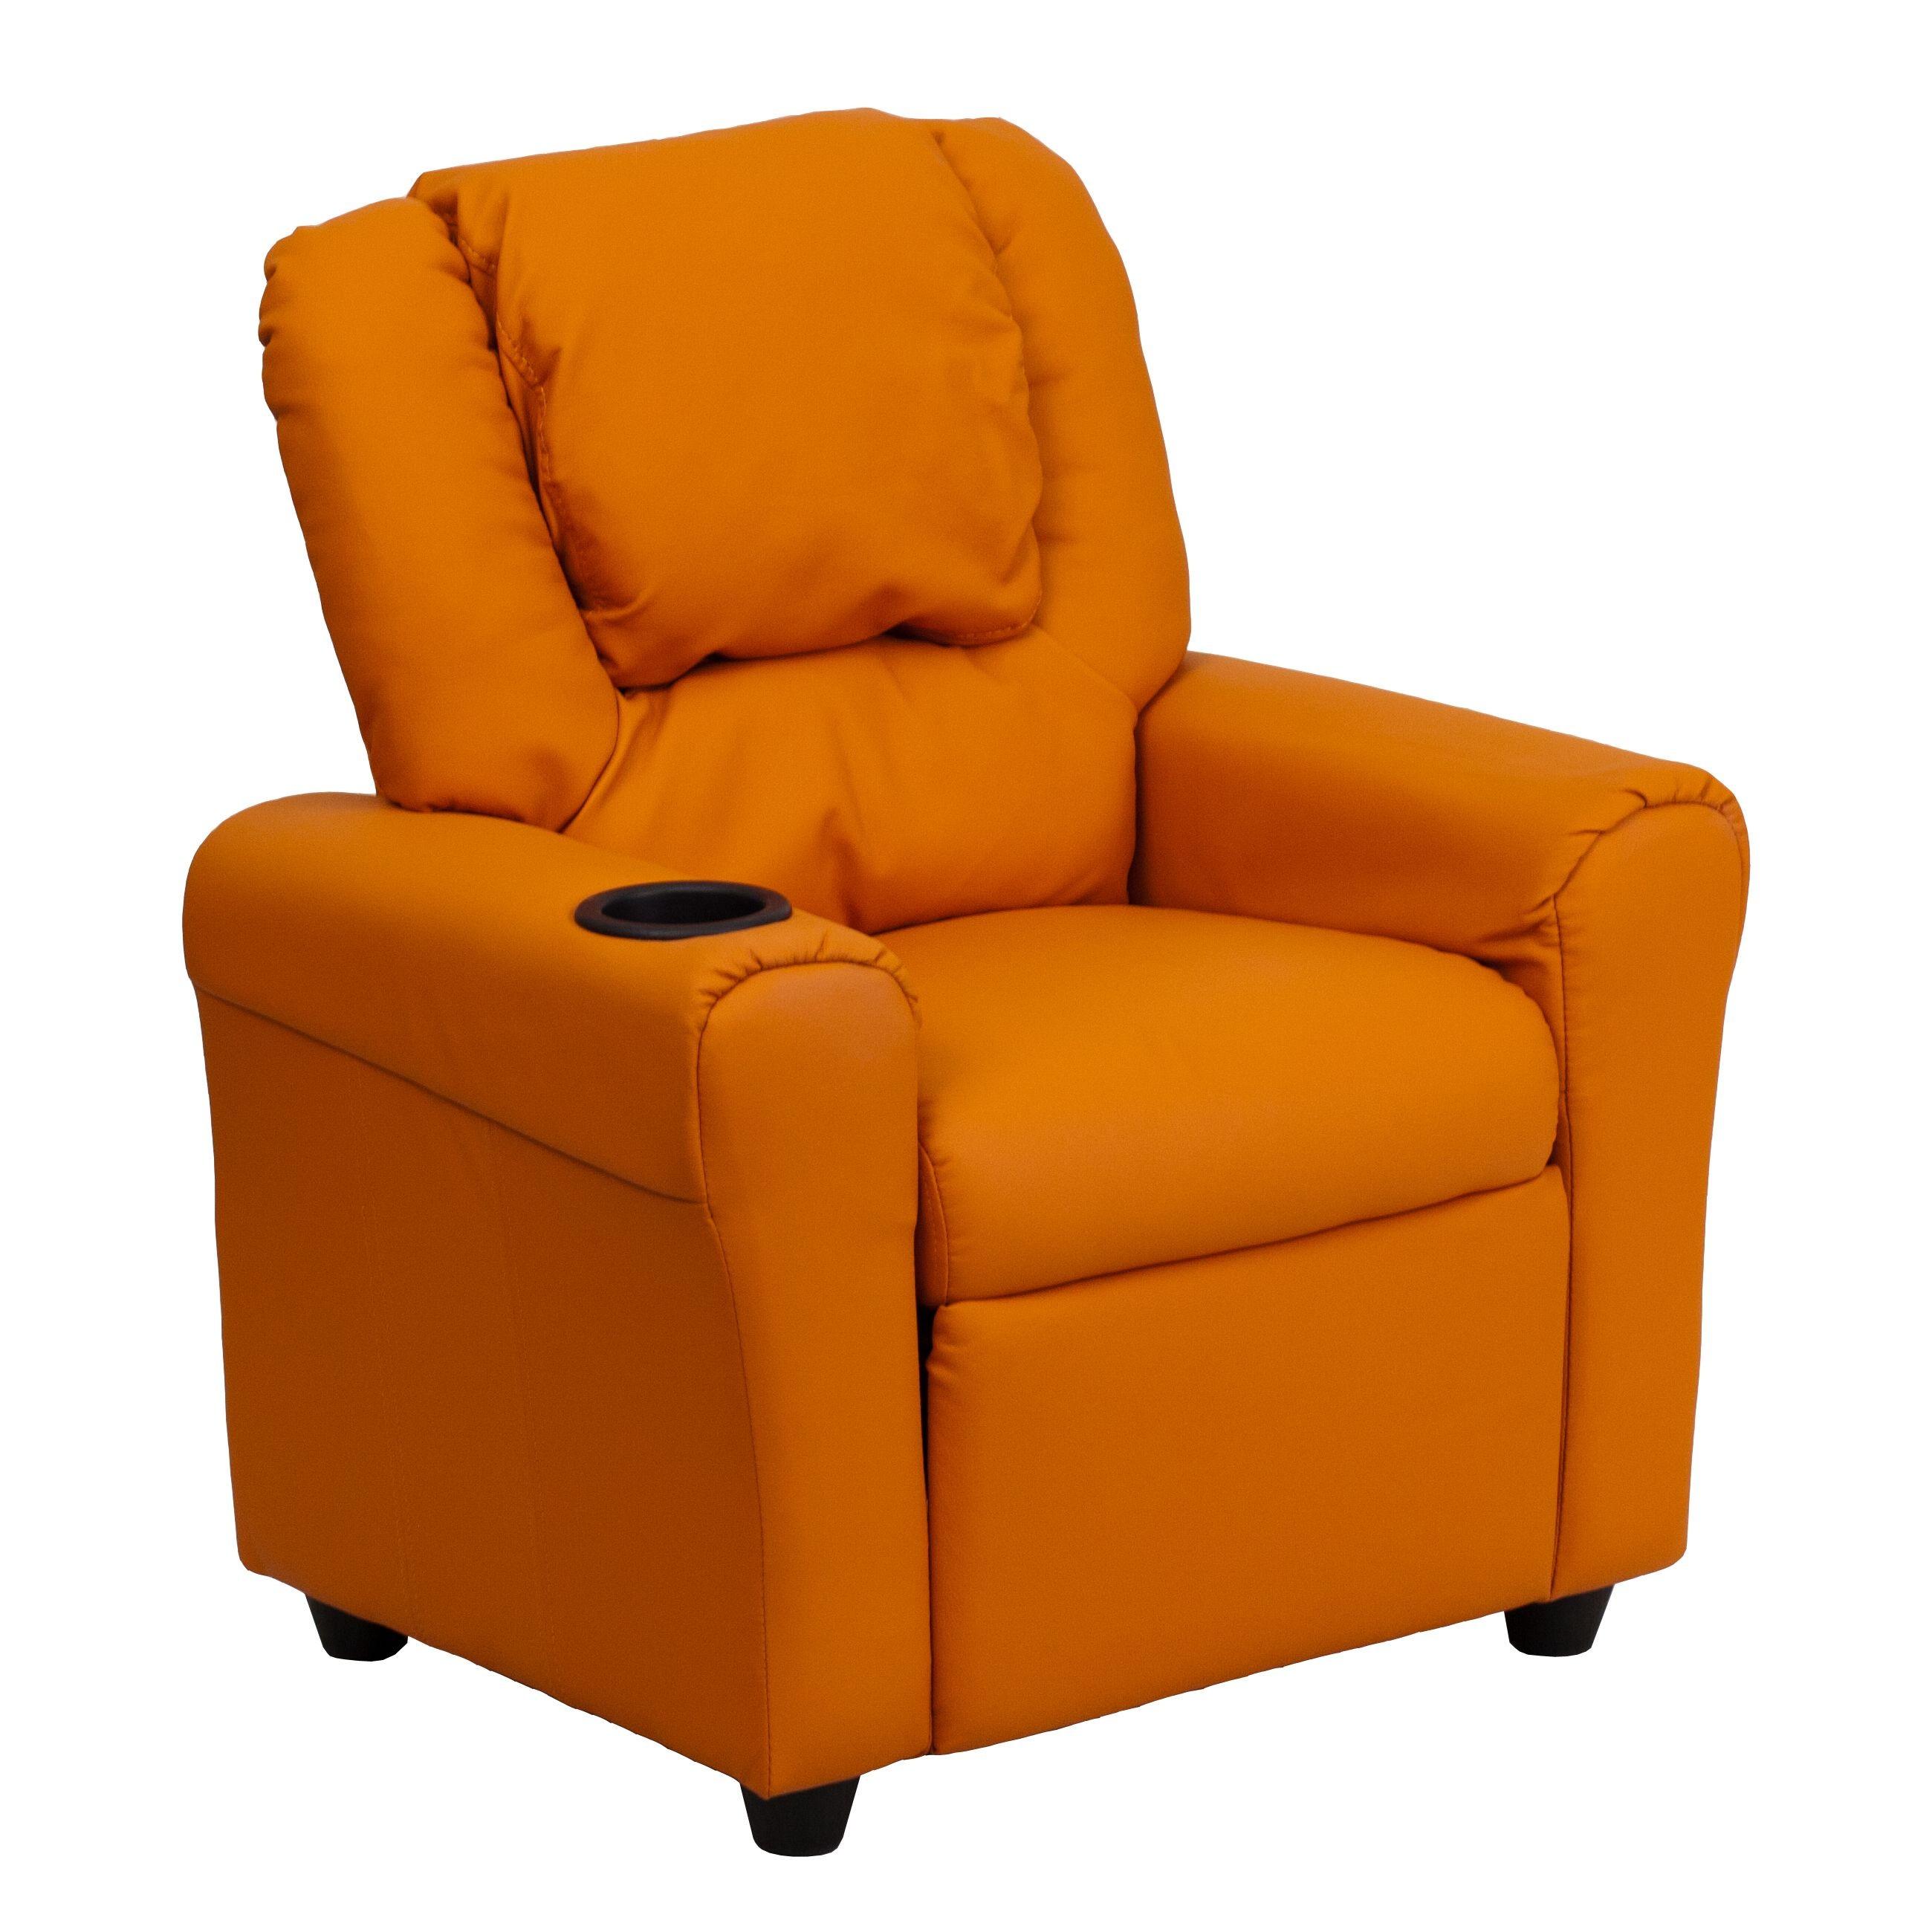 Flash Furniture DG-ULT-KID-ORANGE-GG Contemporary Orange Vinyl Kids Recliner with Cup Holder and Headrest